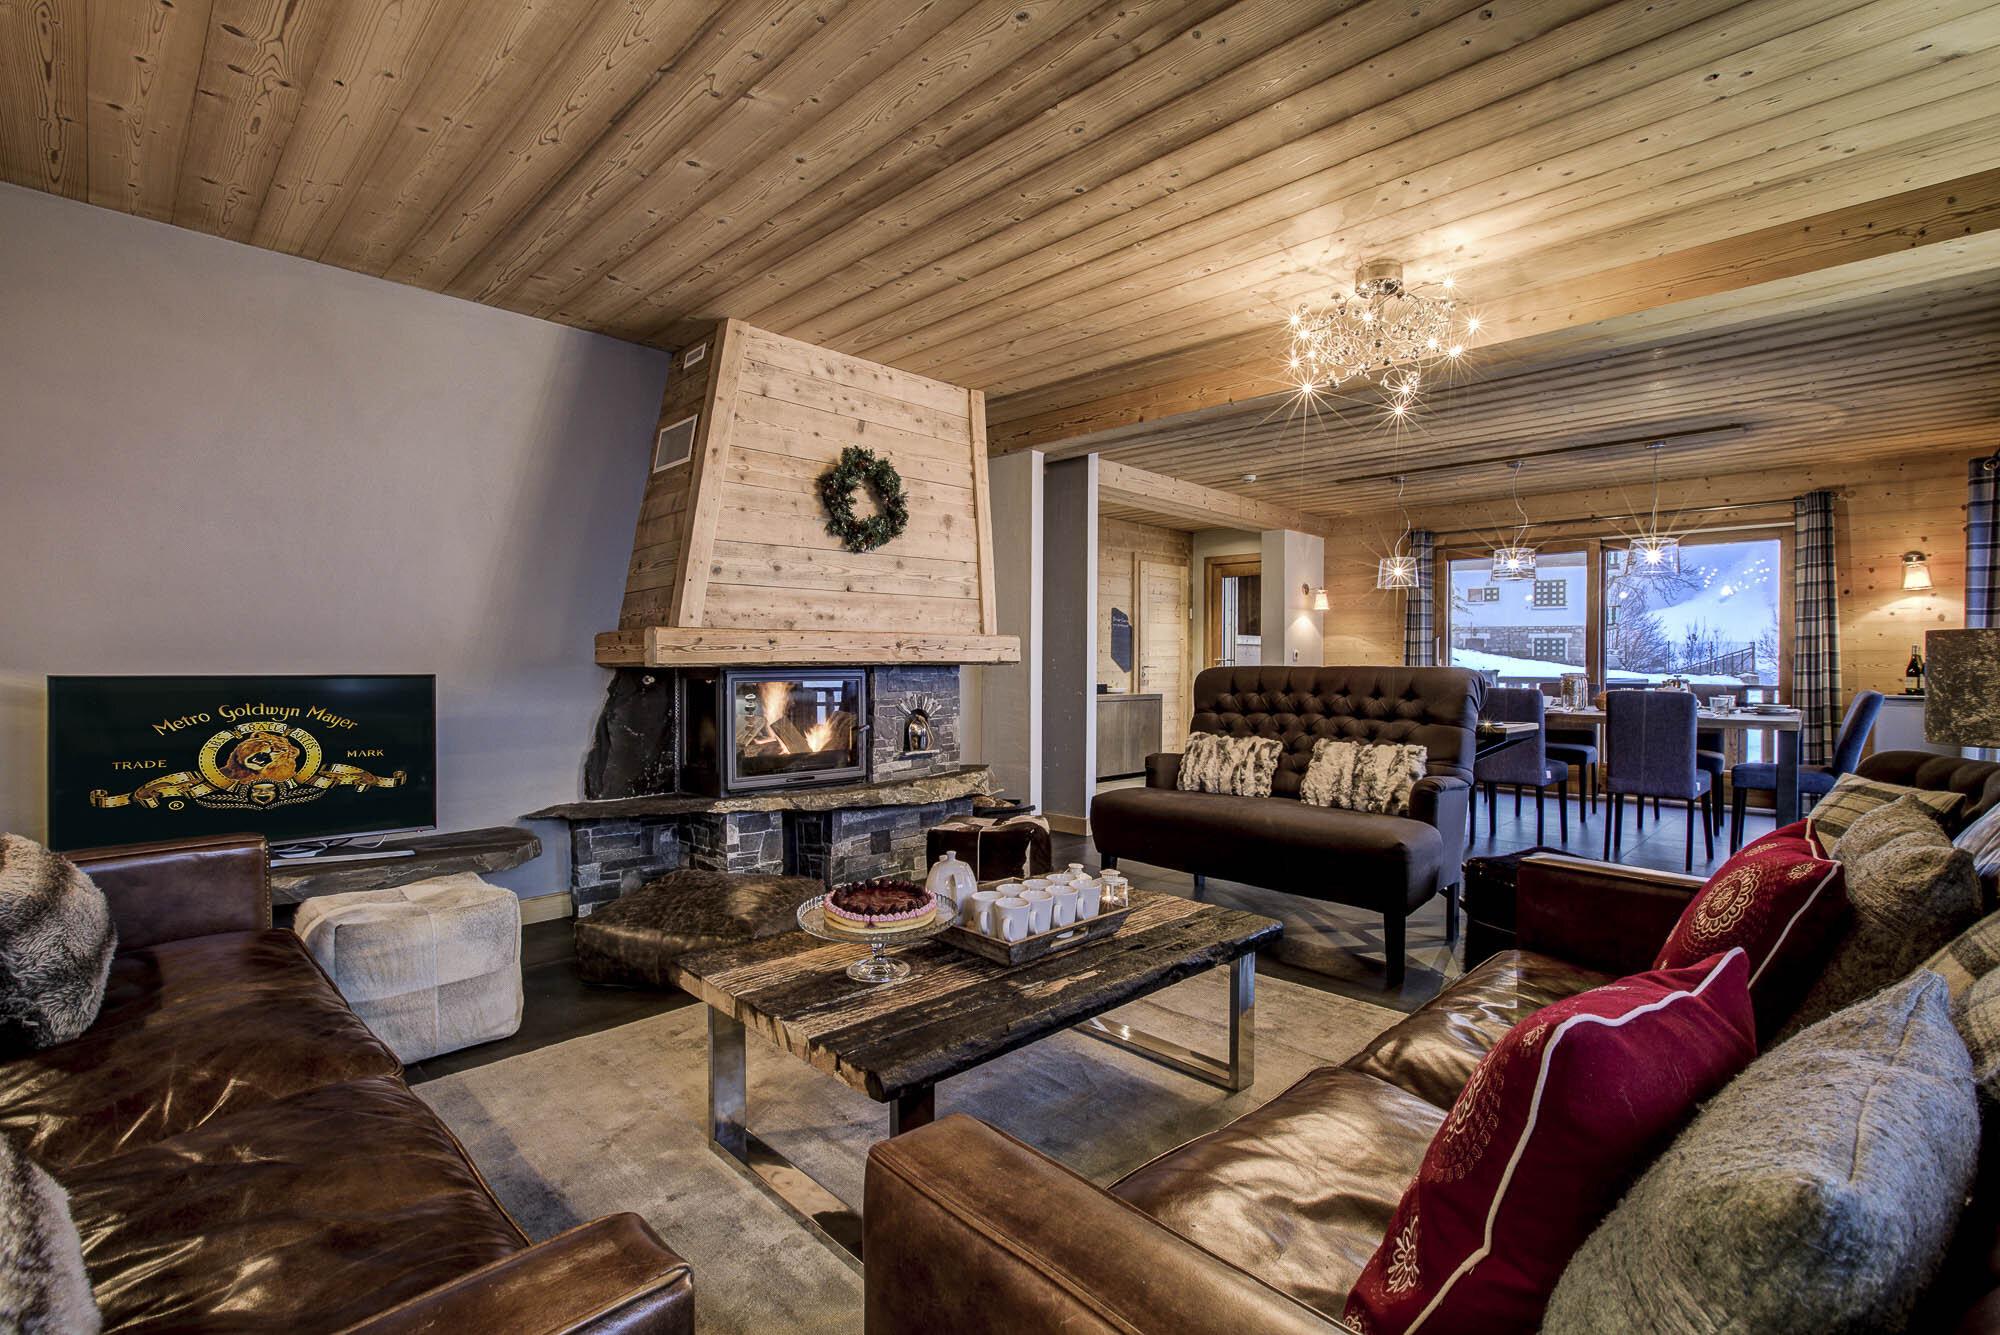 tg-ski-luxury-chalet-les-pierrys-morzine-017.jpg